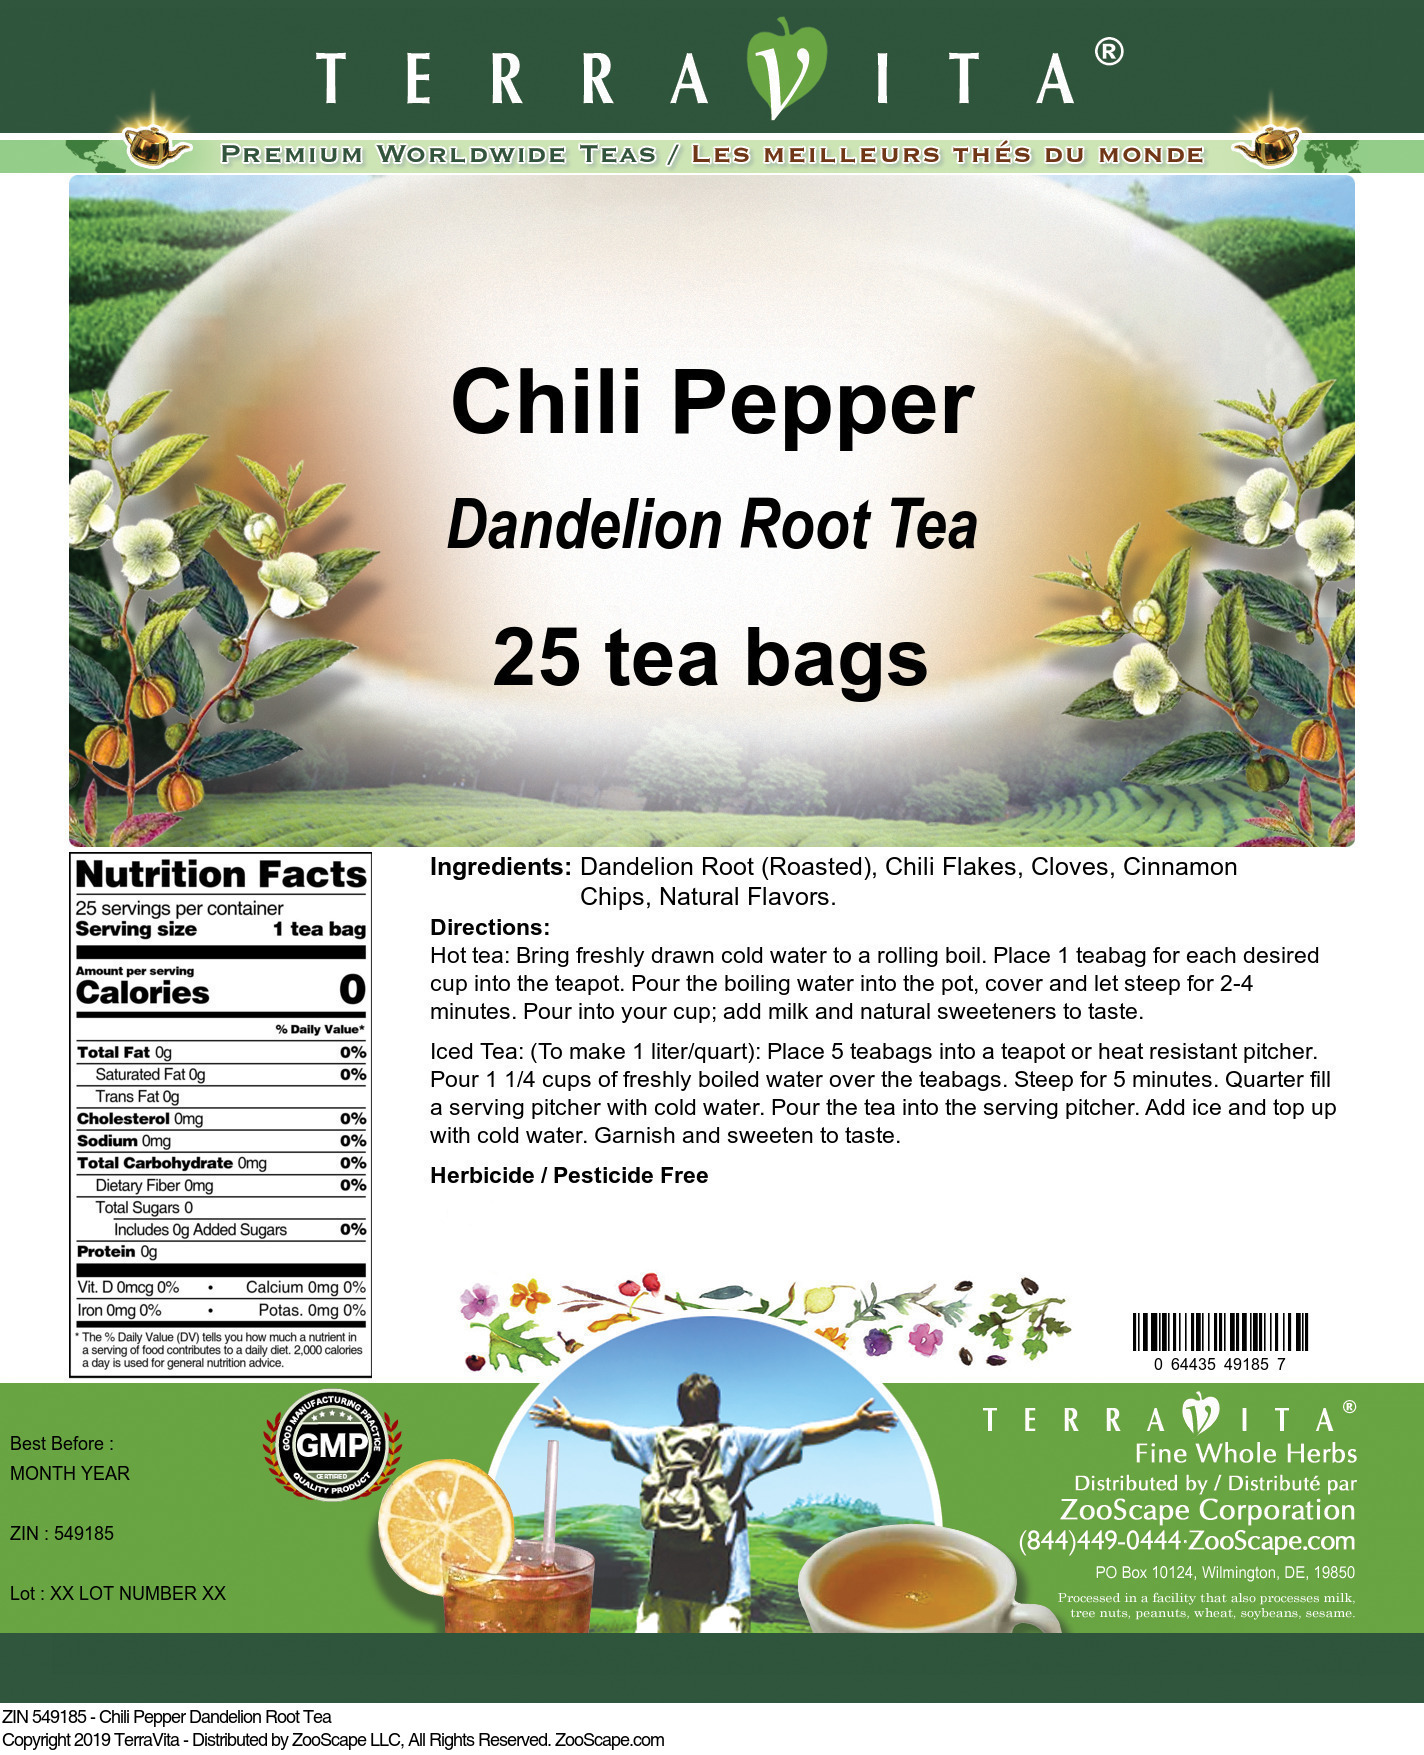 Chili Pepper Dandelion Root